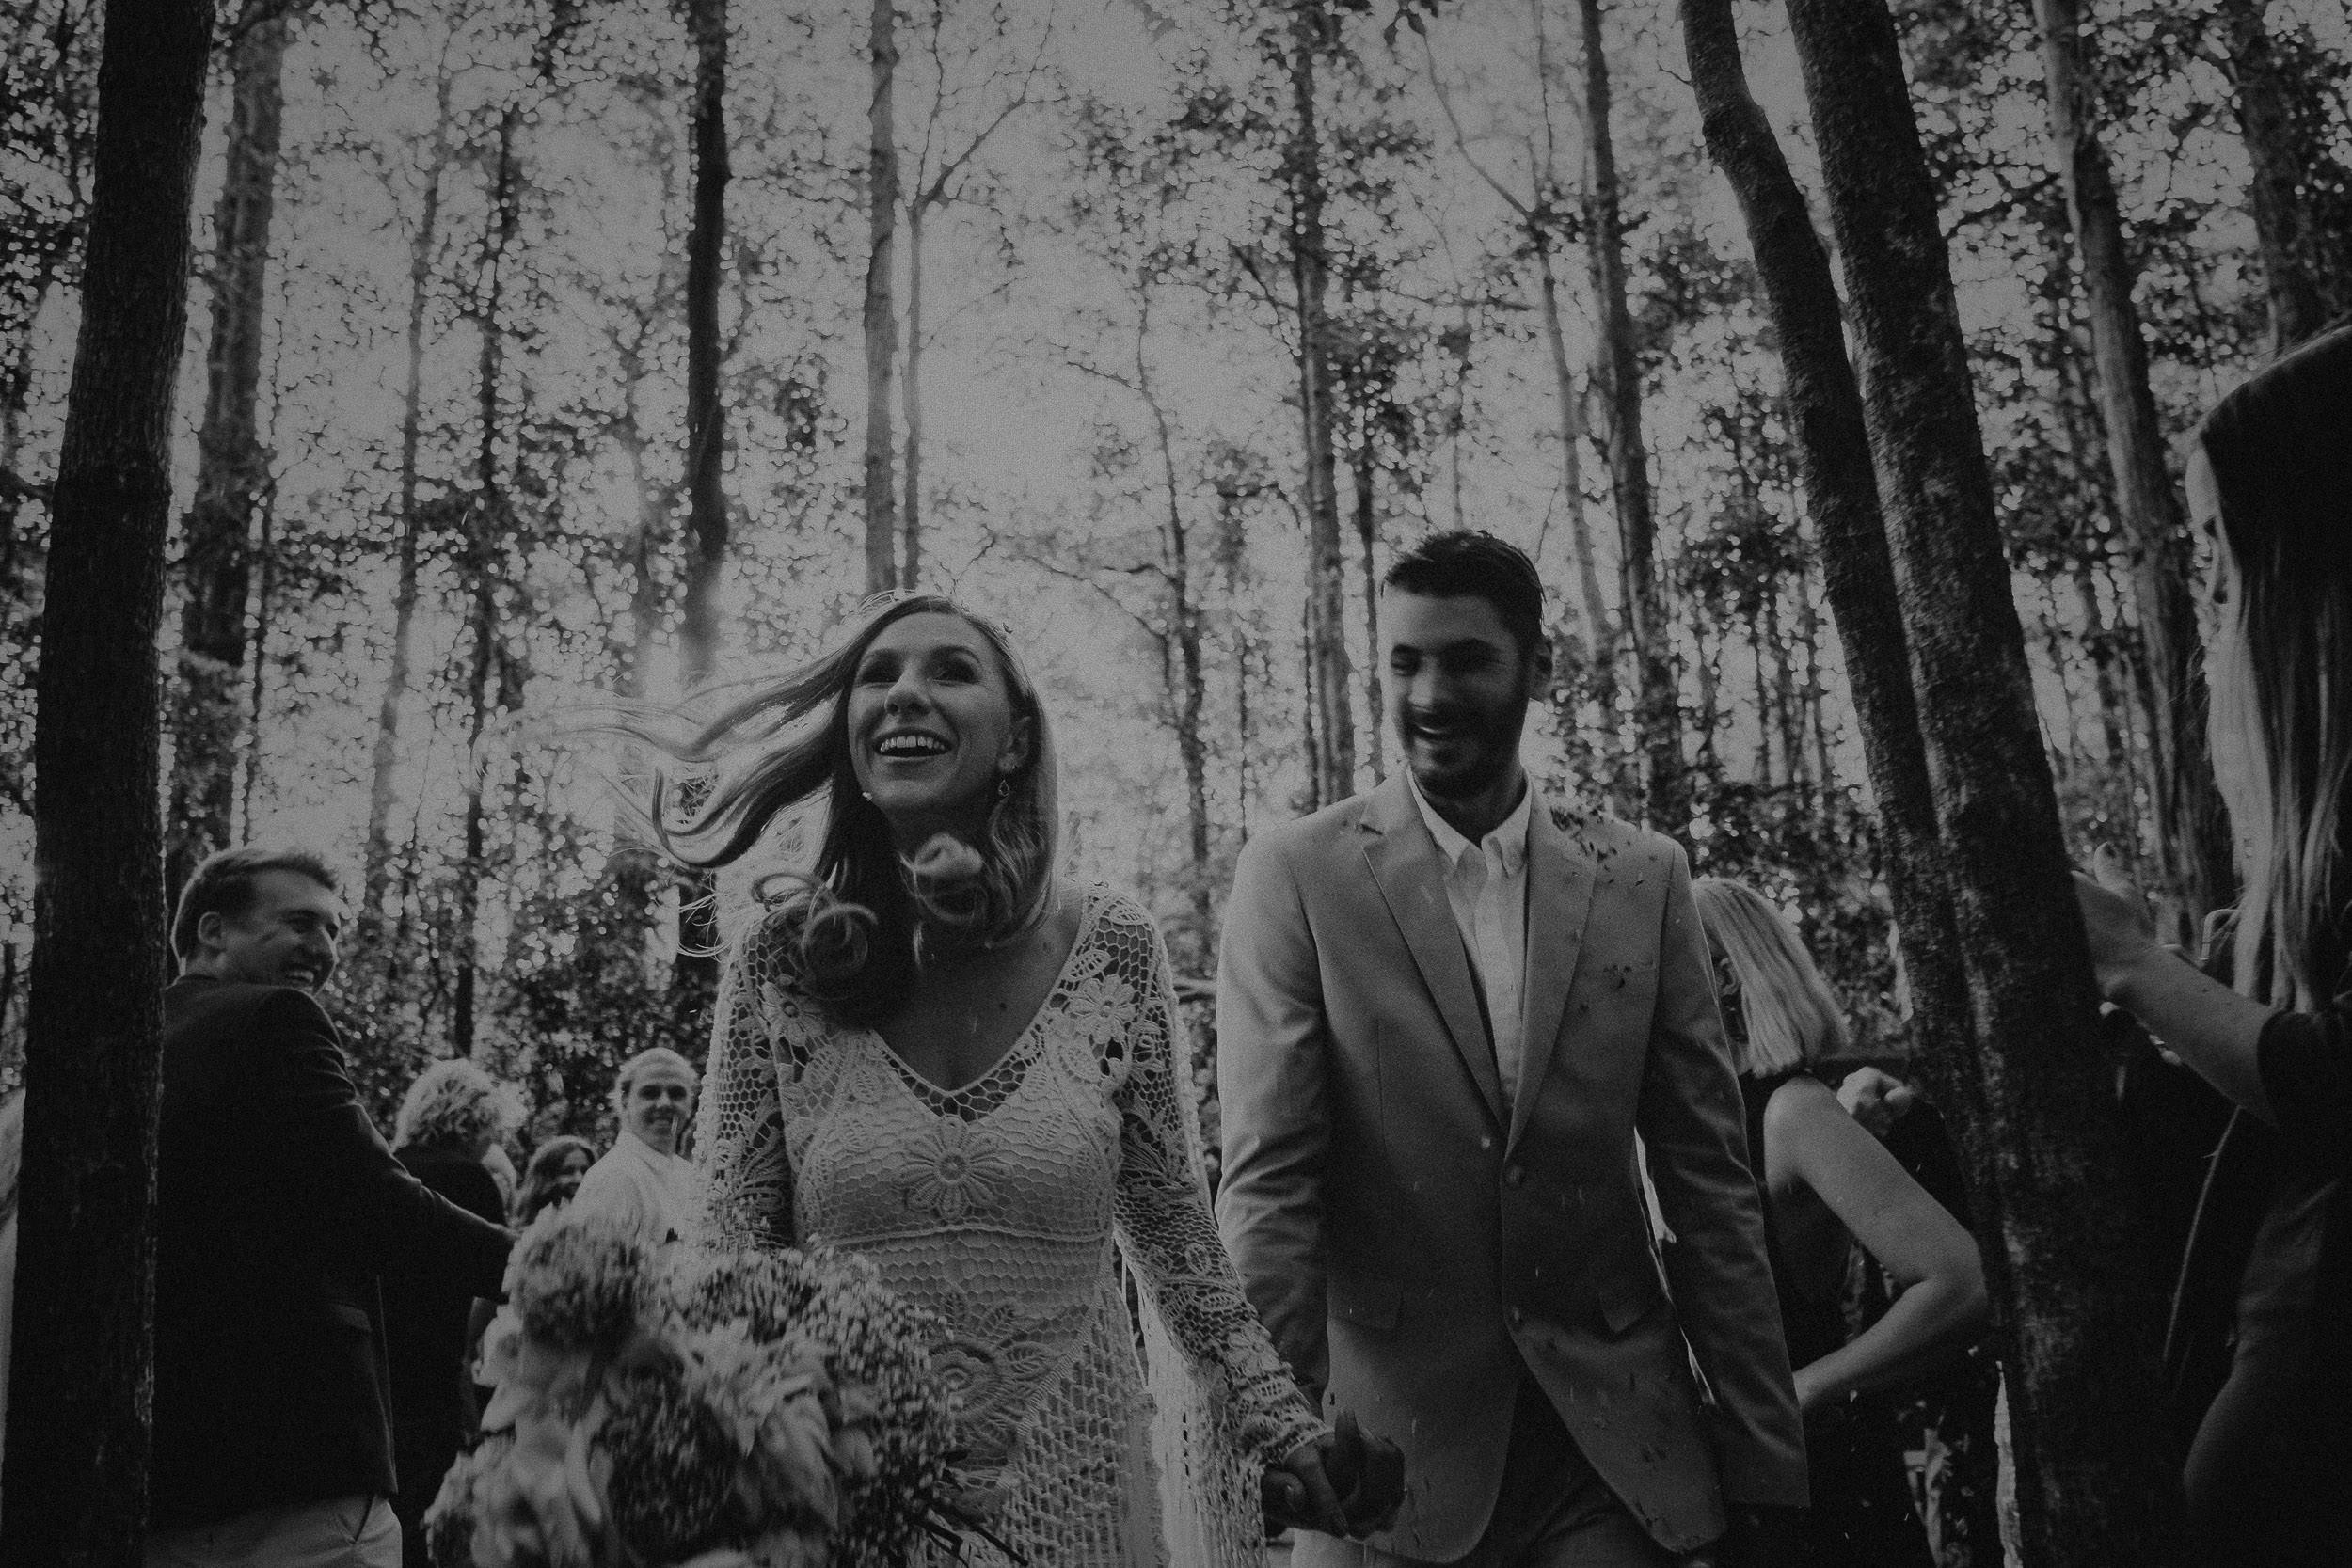 S&A Elopement - Kings & Thieves - Shred 'Til Dead - Central Coast Beach Forest Wedding - 292.jpg